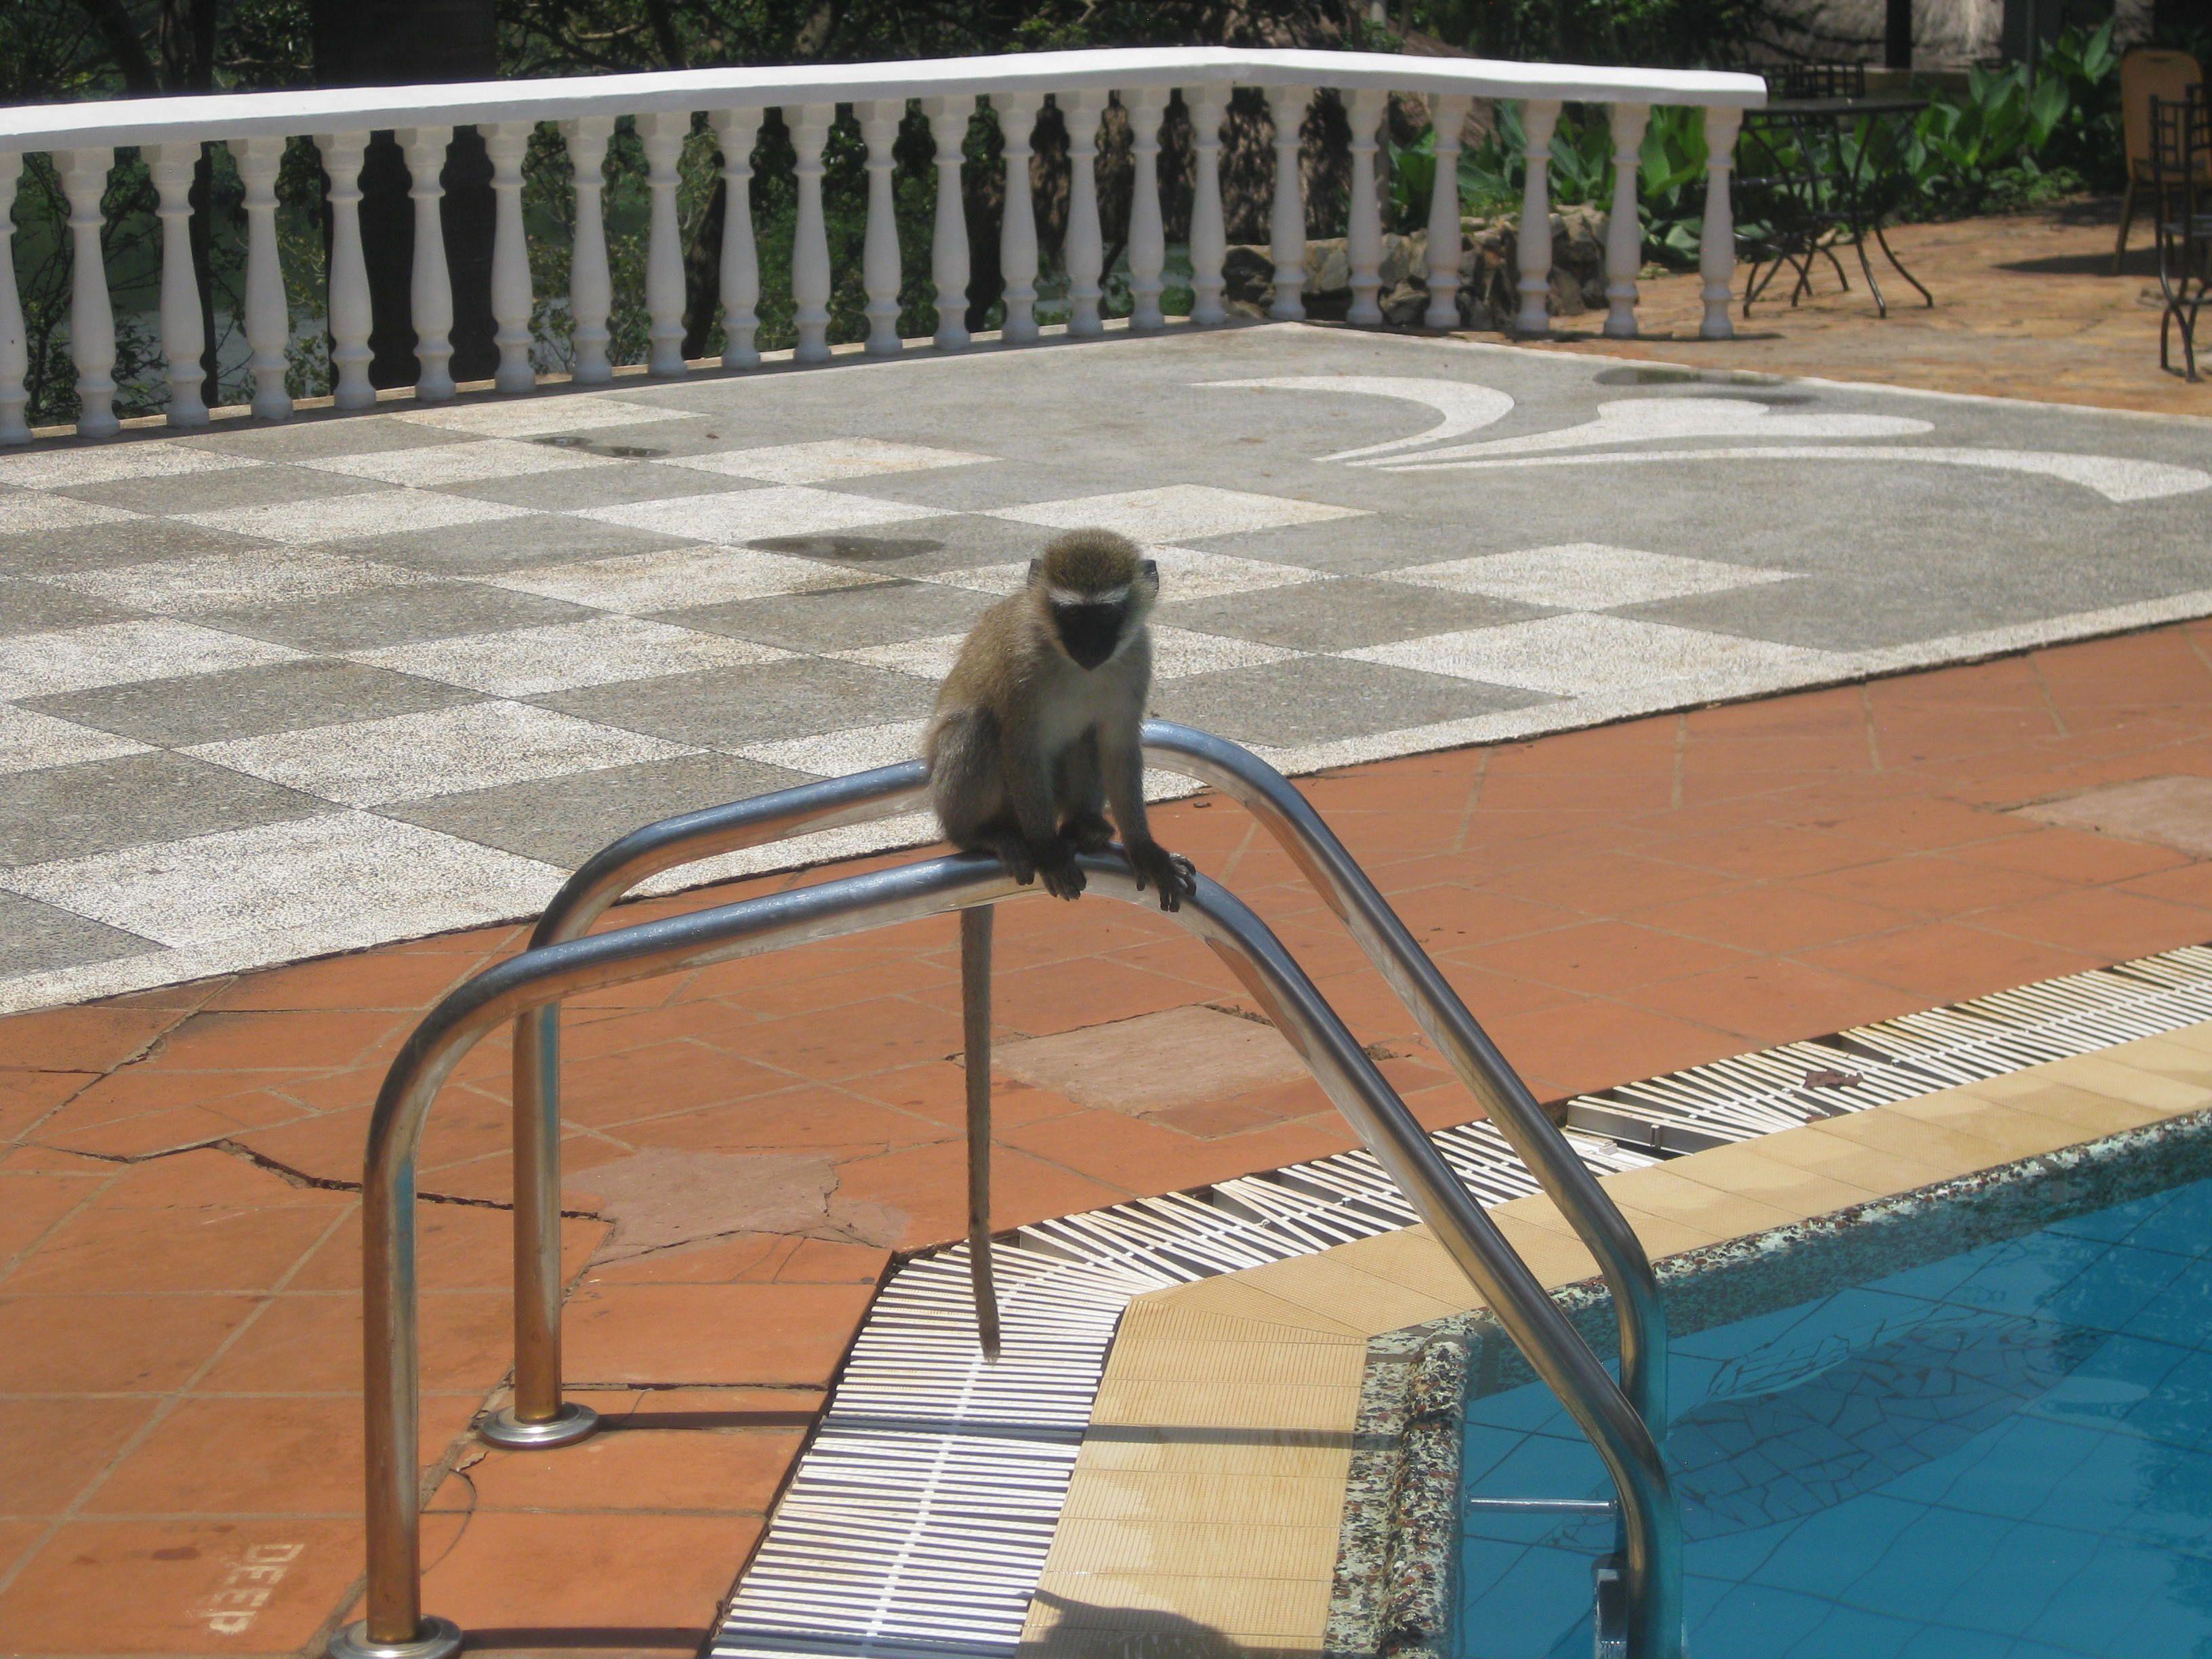 Pool monkey